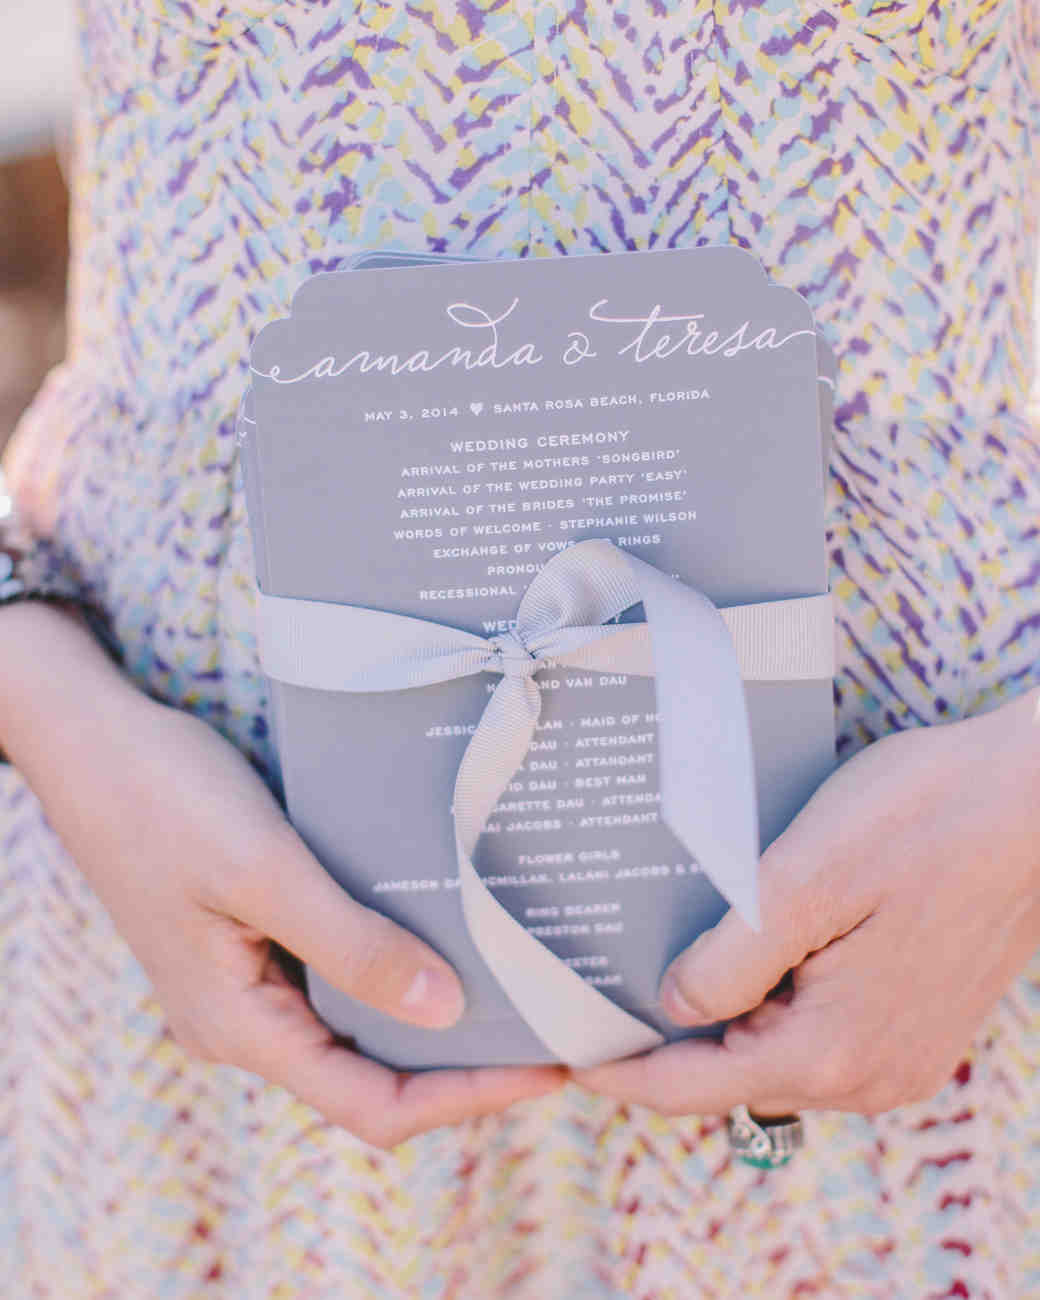 teresa-amanda-wedding-program-9537-s111694-1114.jpg